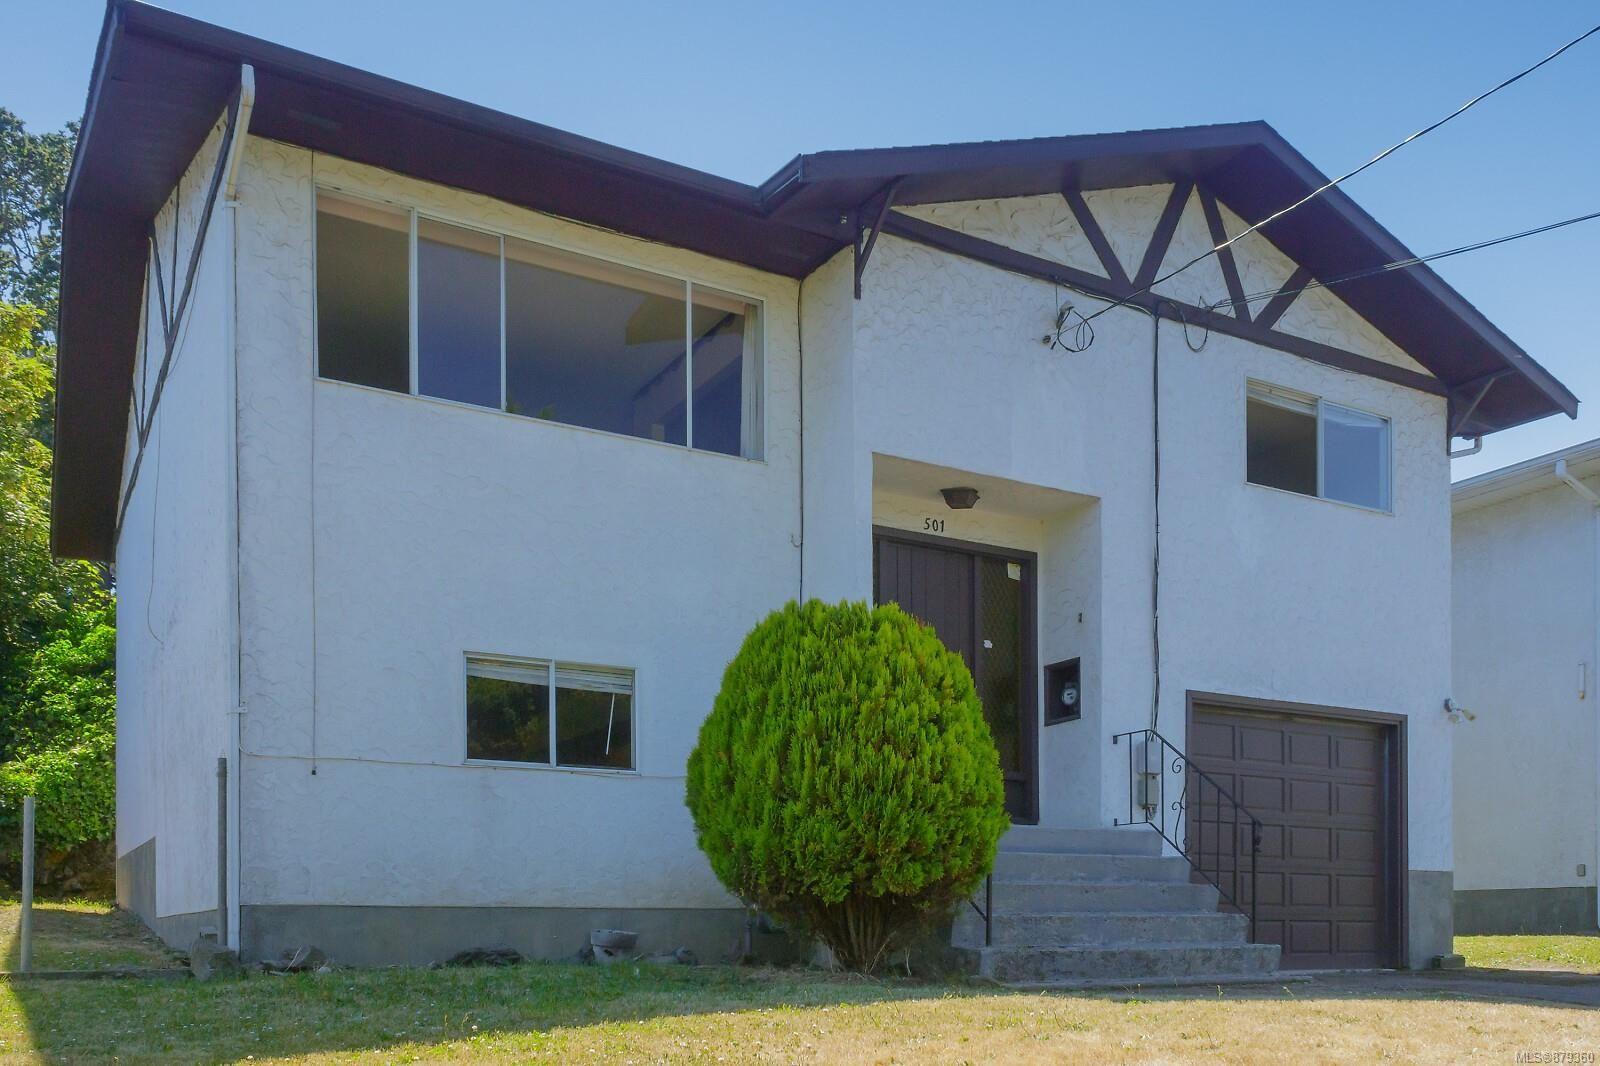 Main Photo: 501 Ker Ave in : SW Tillicum House for sale (Saanich West)  : MLS®# 879360